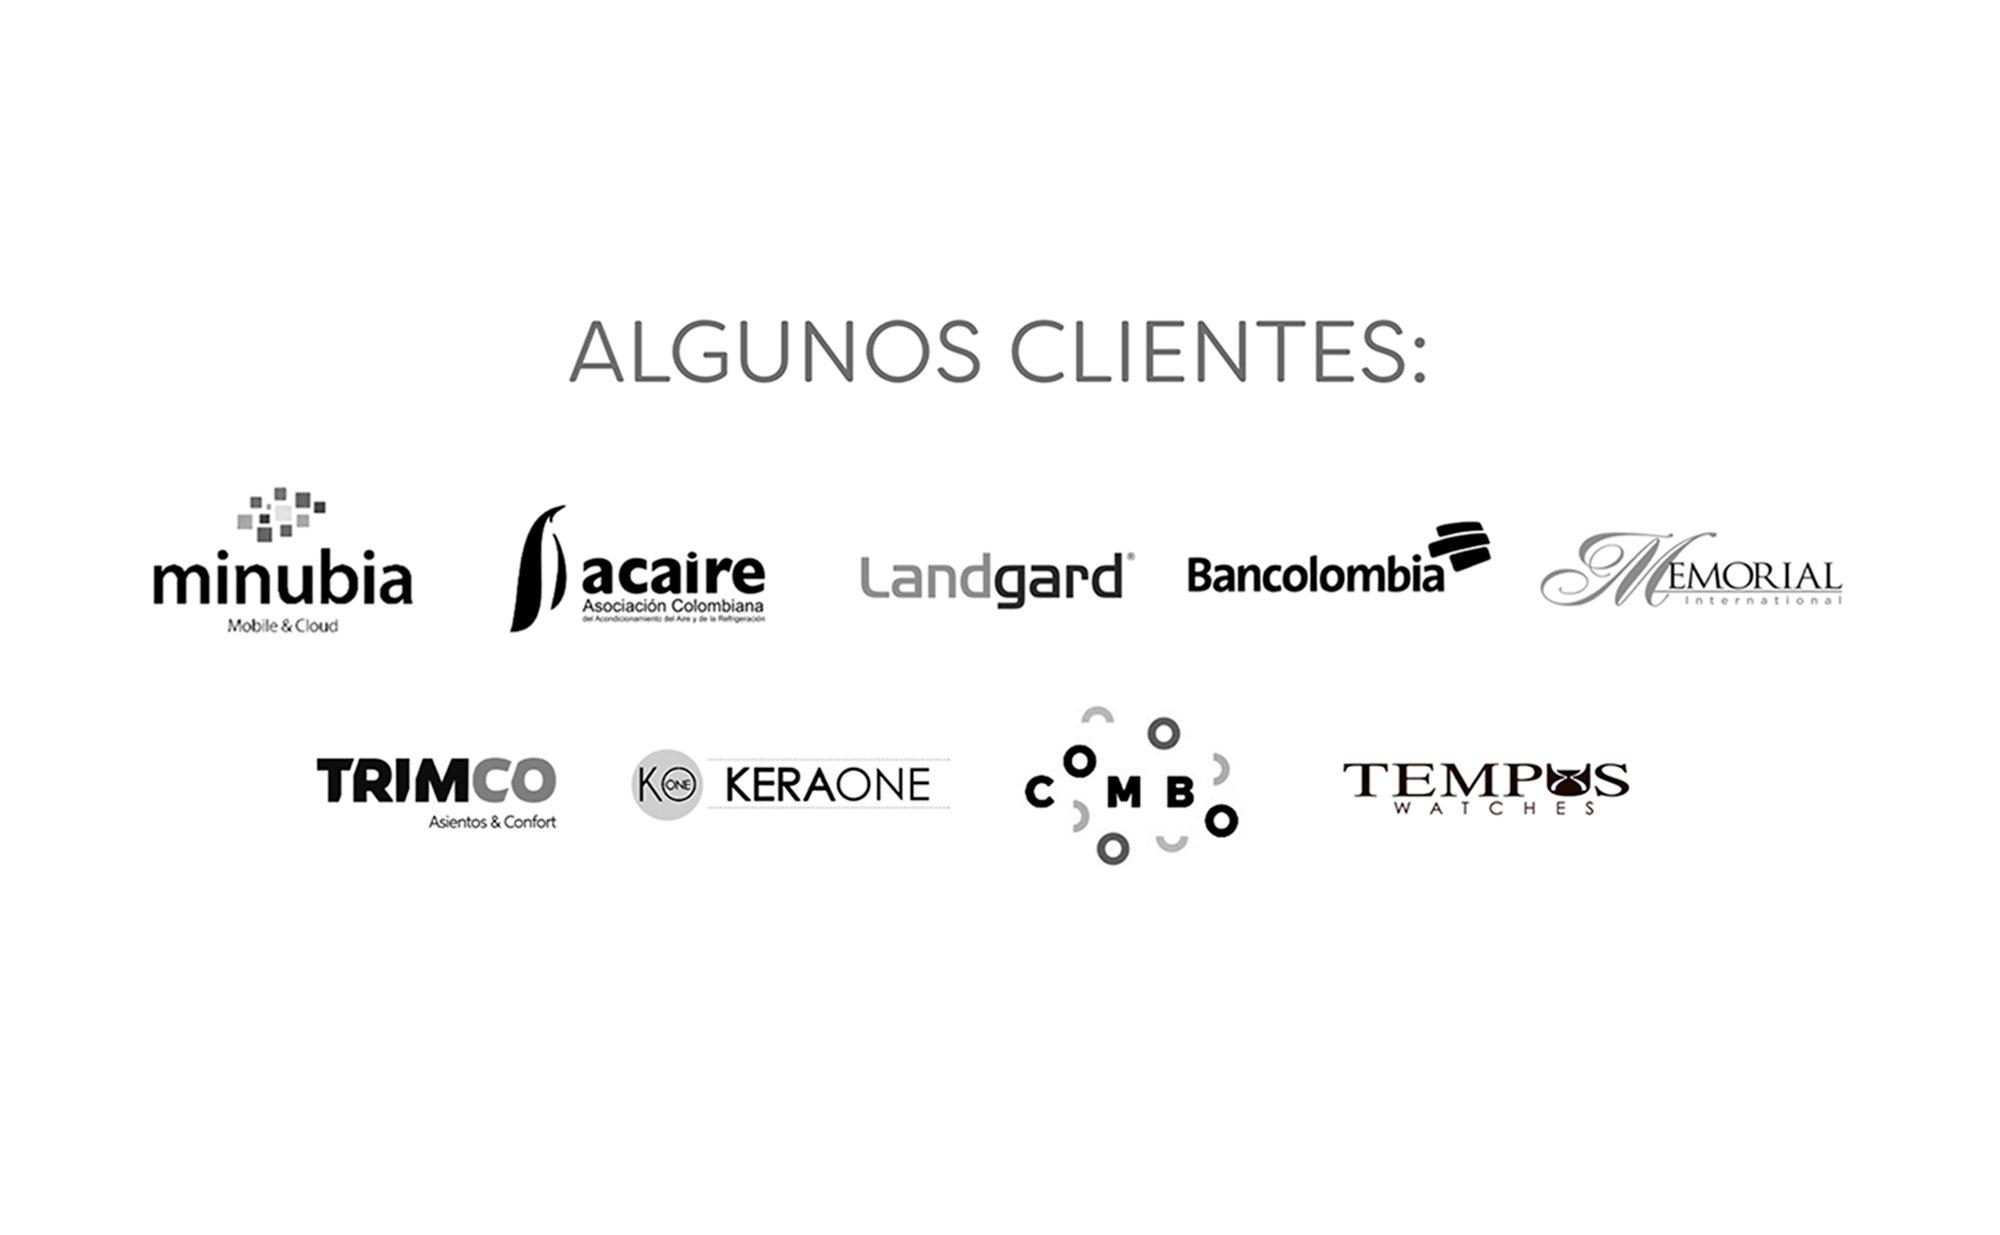 Algunos clientes: minubia, acaire, Landgard, Bancolombia, Memorial, TrimCo, Keraone, Combo, Tempus